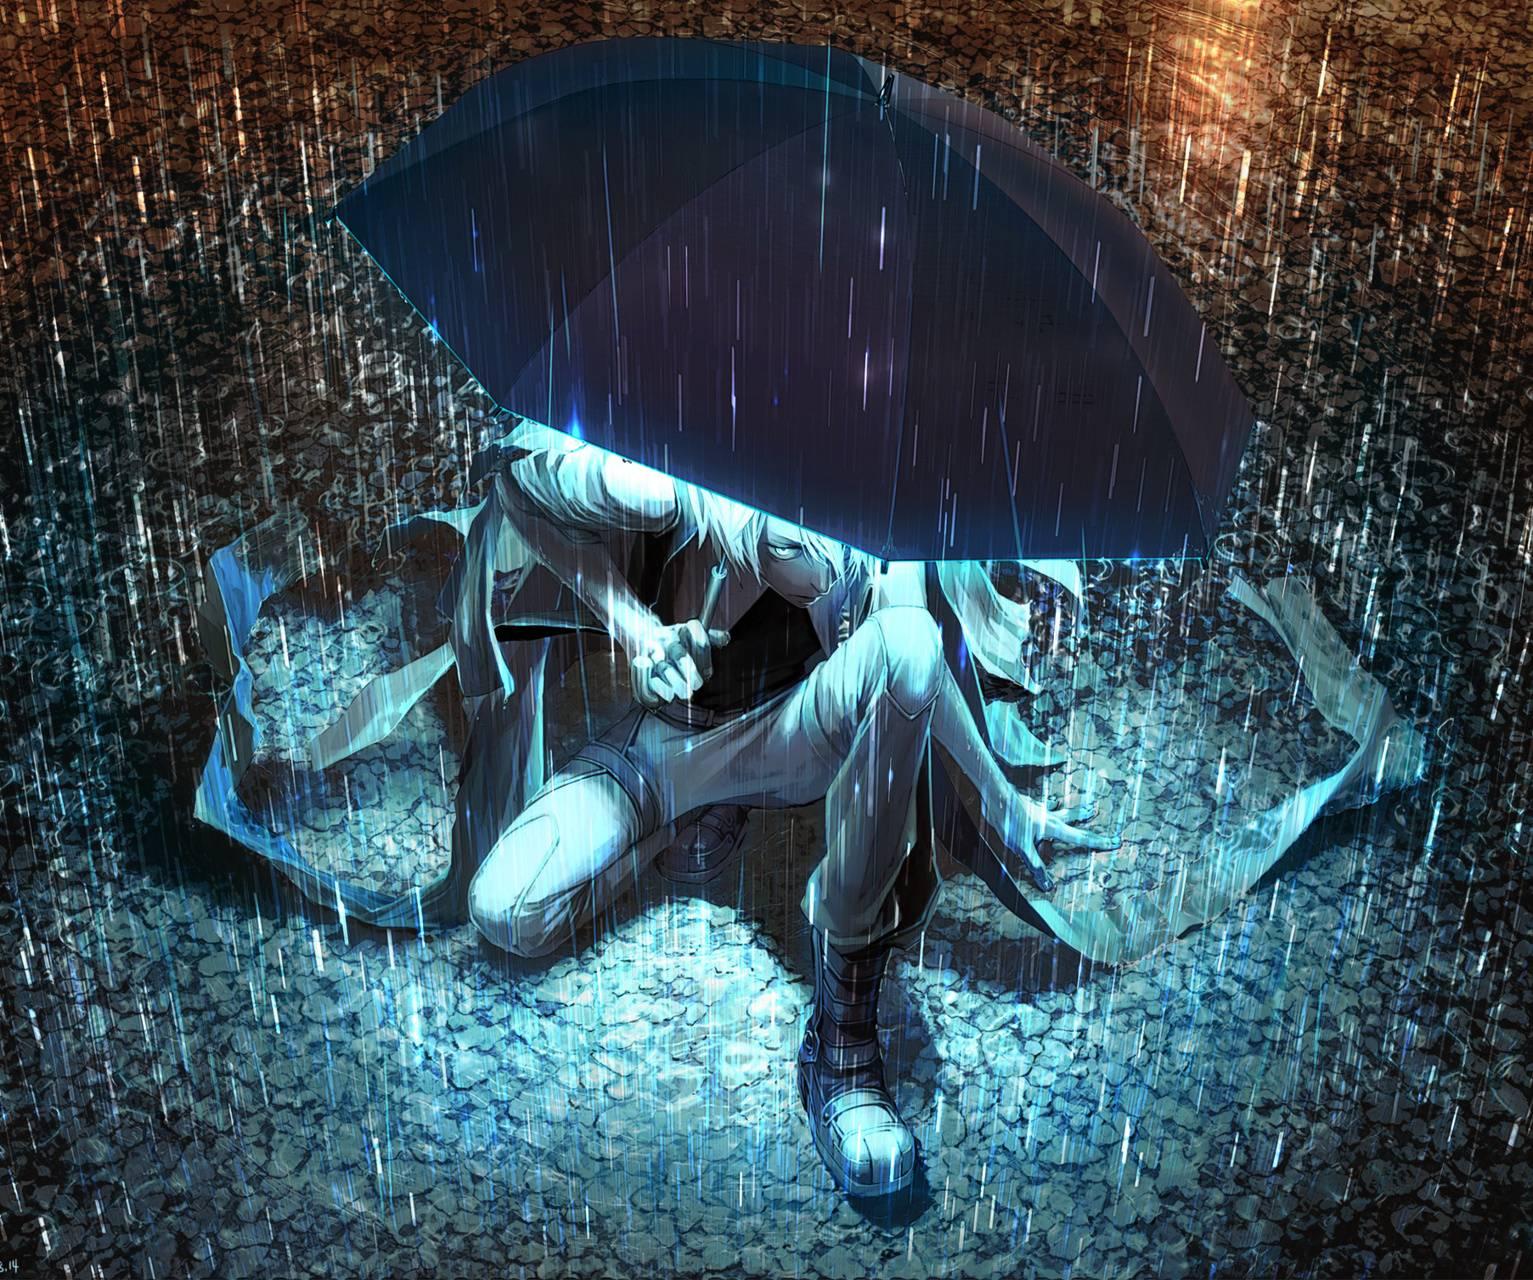 Anime Rain